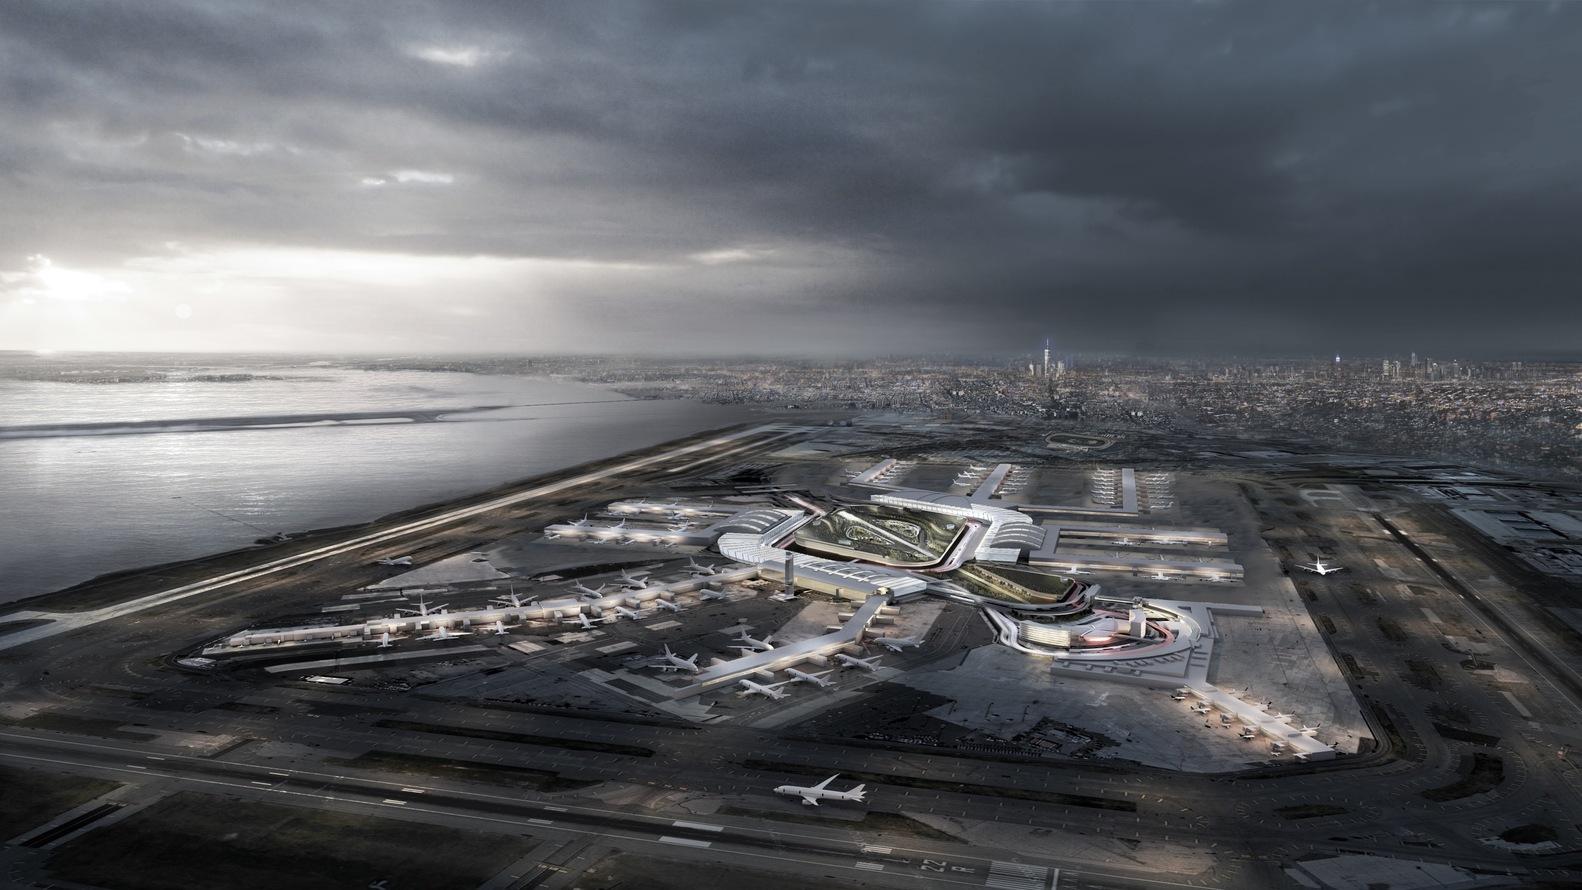 Aeroporto Jfk : Gallery of new york plans $10 billion renovation of jfk airport 1